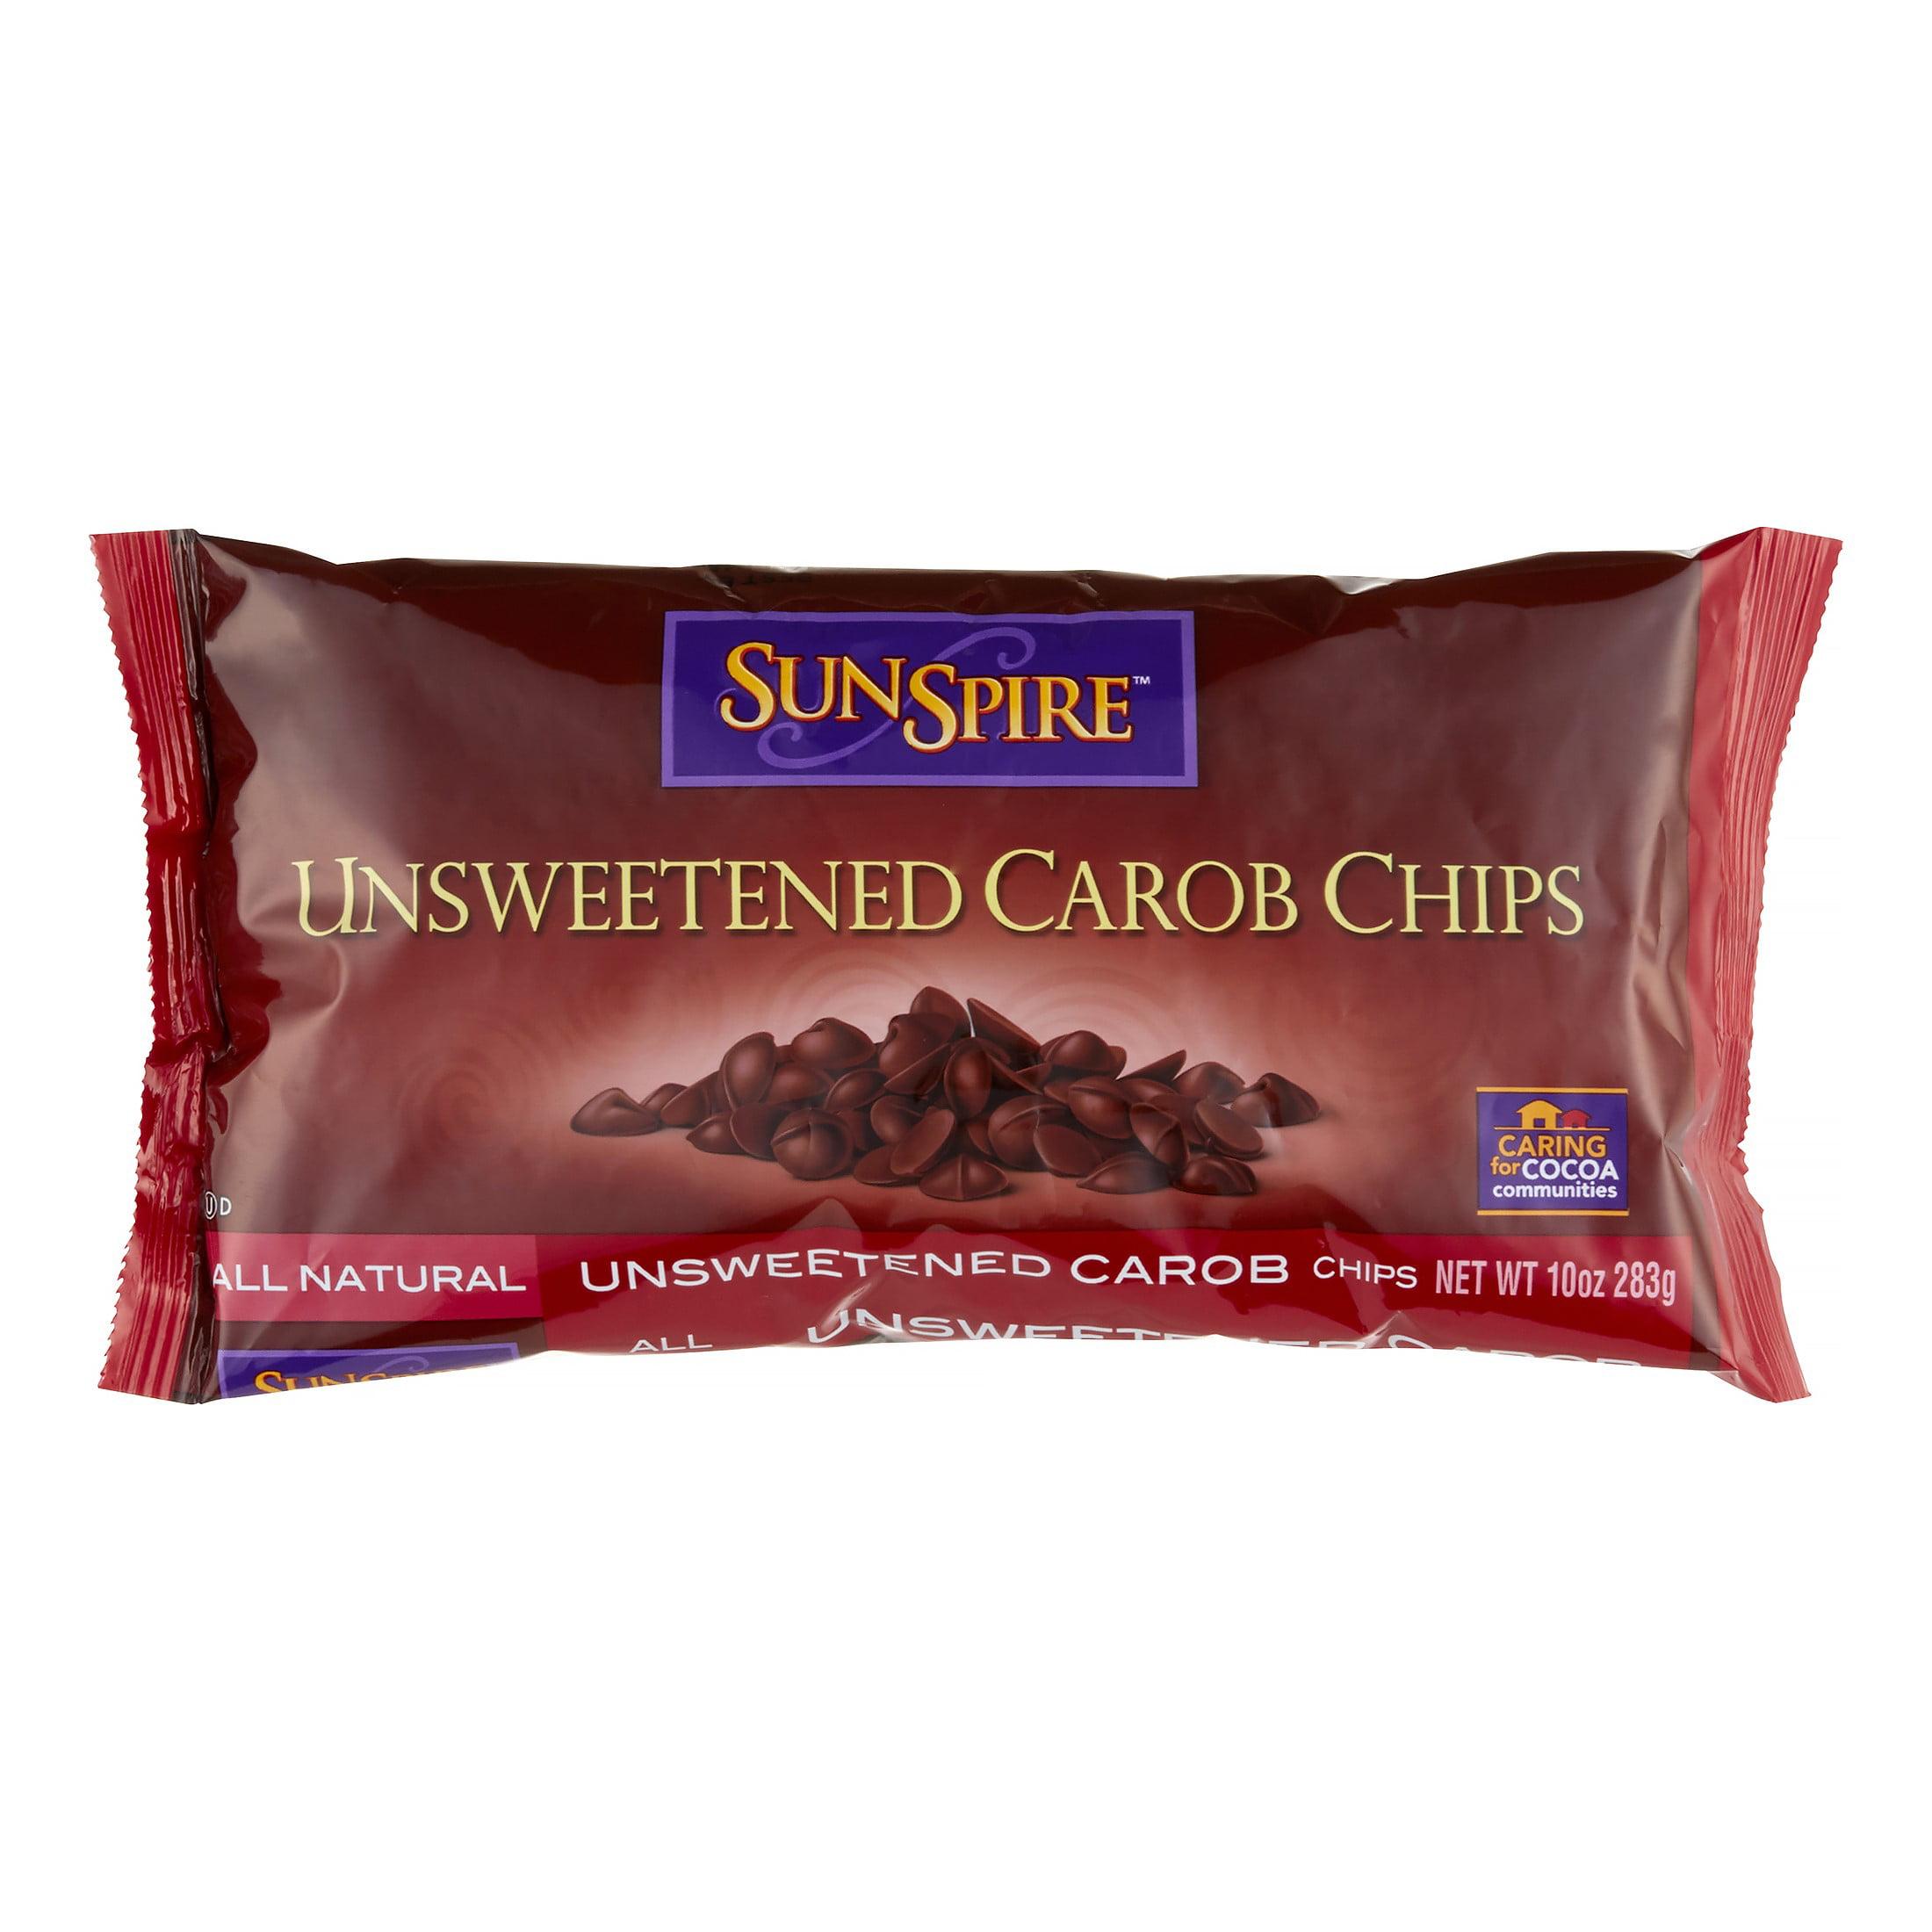 SunSpire Unsweetened Carob Baking Chips 10 oz